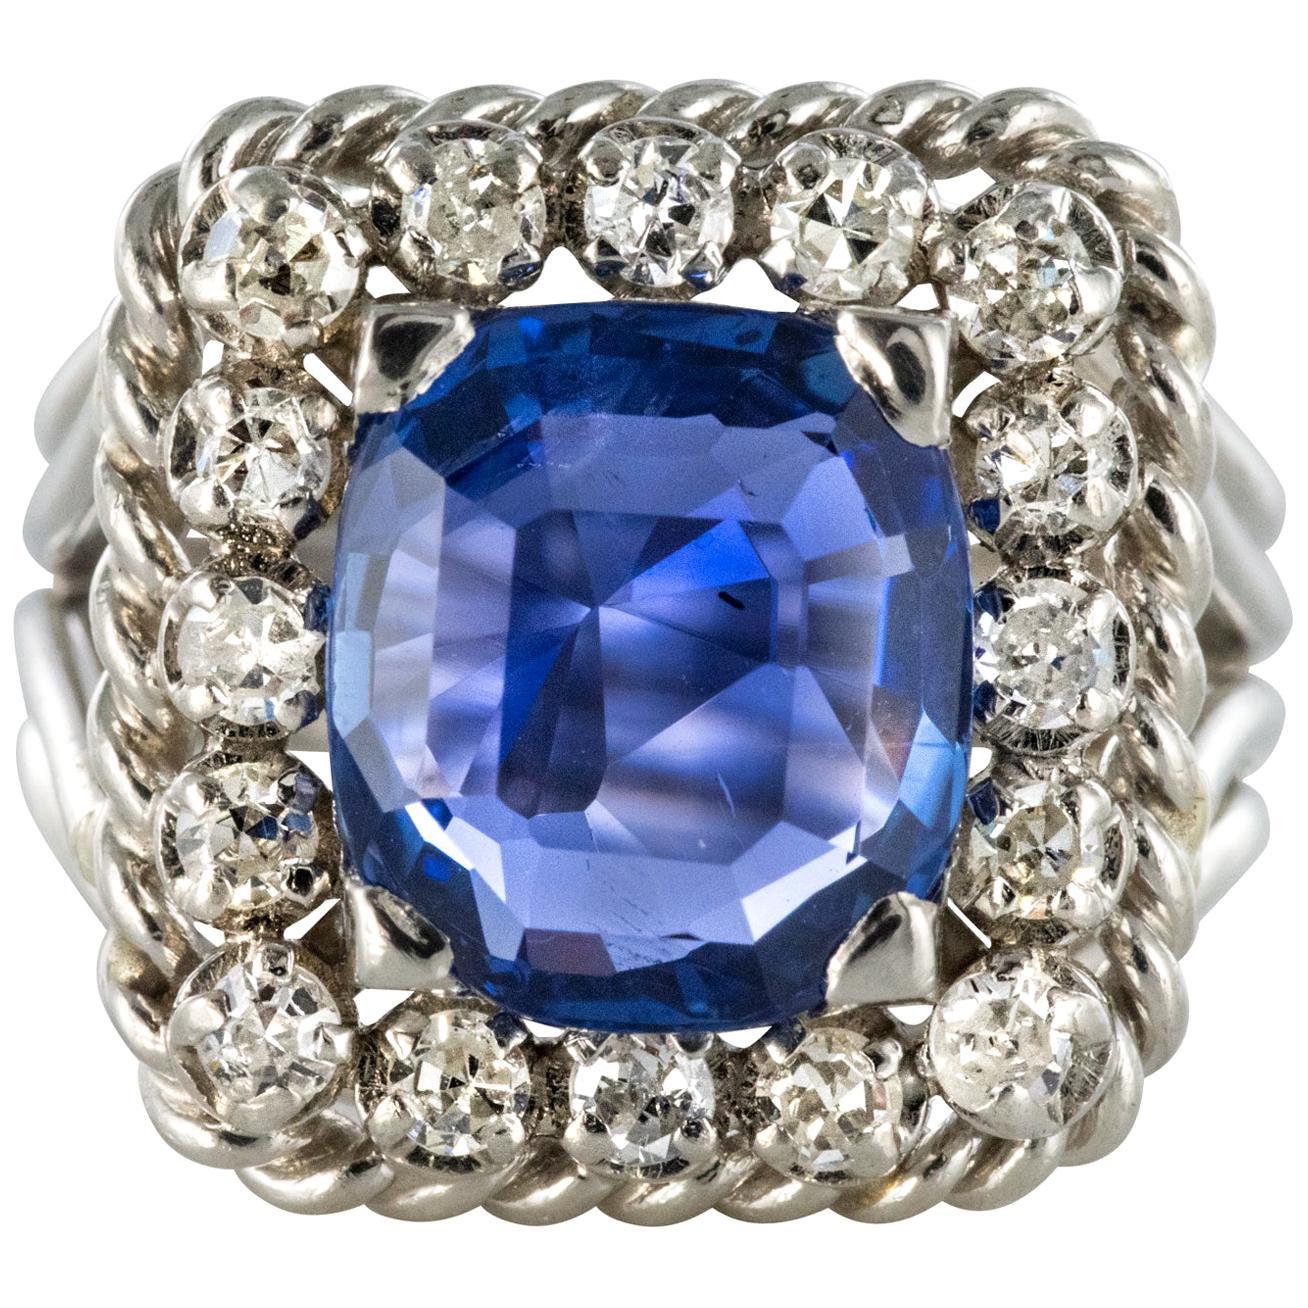 French 1950s Natural Cushion Cut Ceylon Sapphire Diamonds Platinum Ring